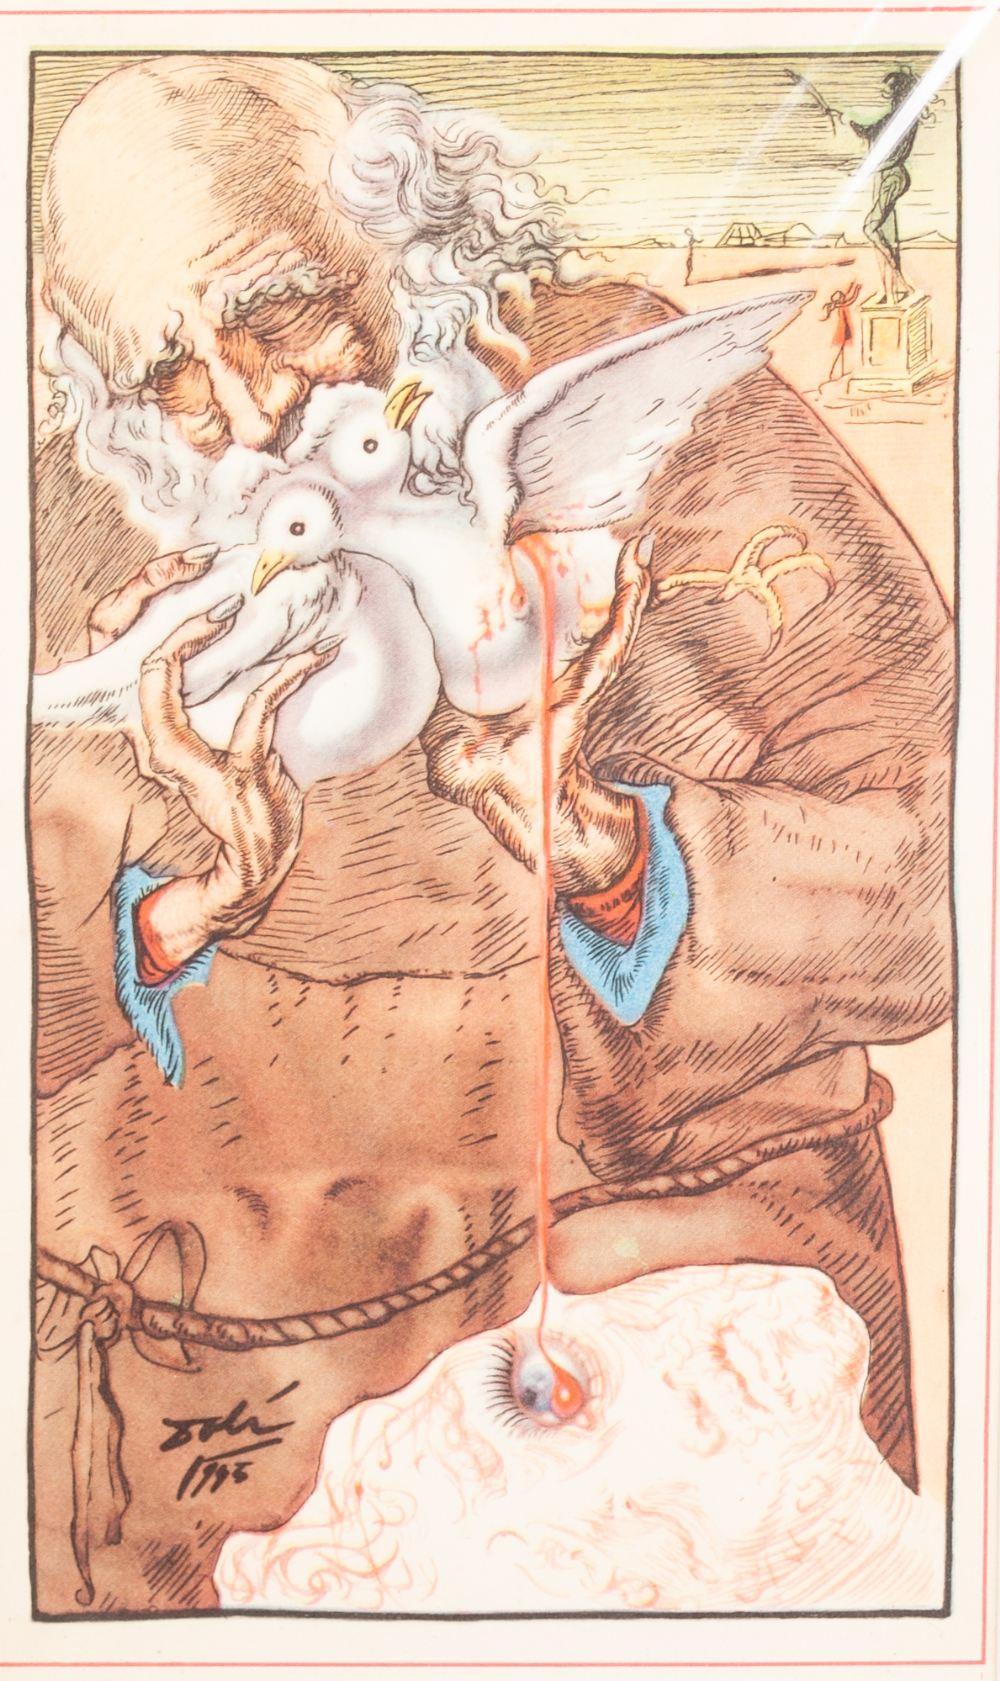 Lot 178 - SALVADOR DALI (Spanish 1904 - 1989) SUITE OF TEN OFFSET LITHOGRAPHS 'Rosalinda', 'Escape', '